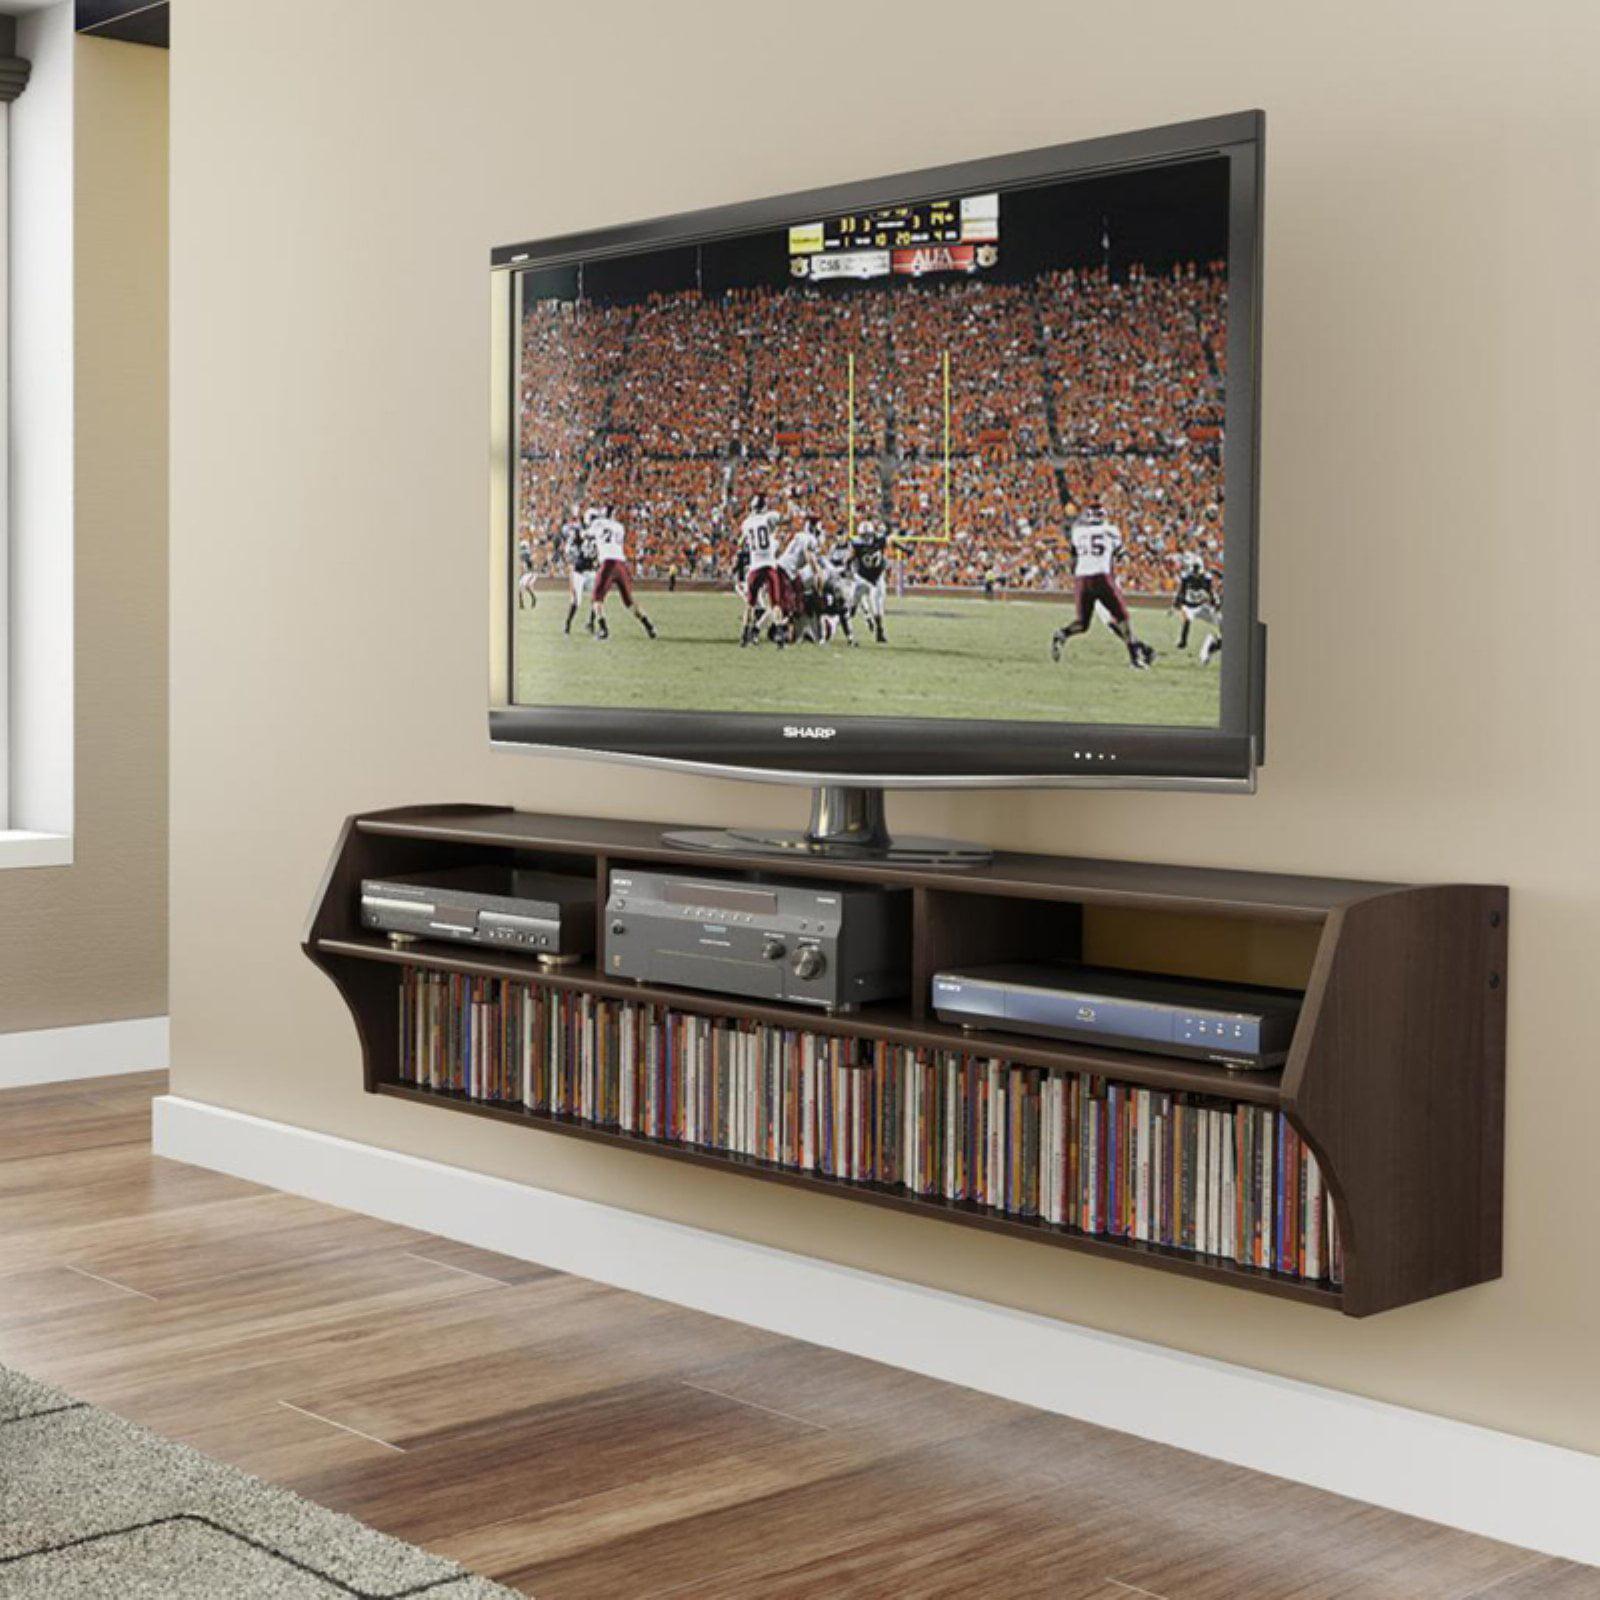 Altus plus floating tv stand for tvs up to 60 walmart com